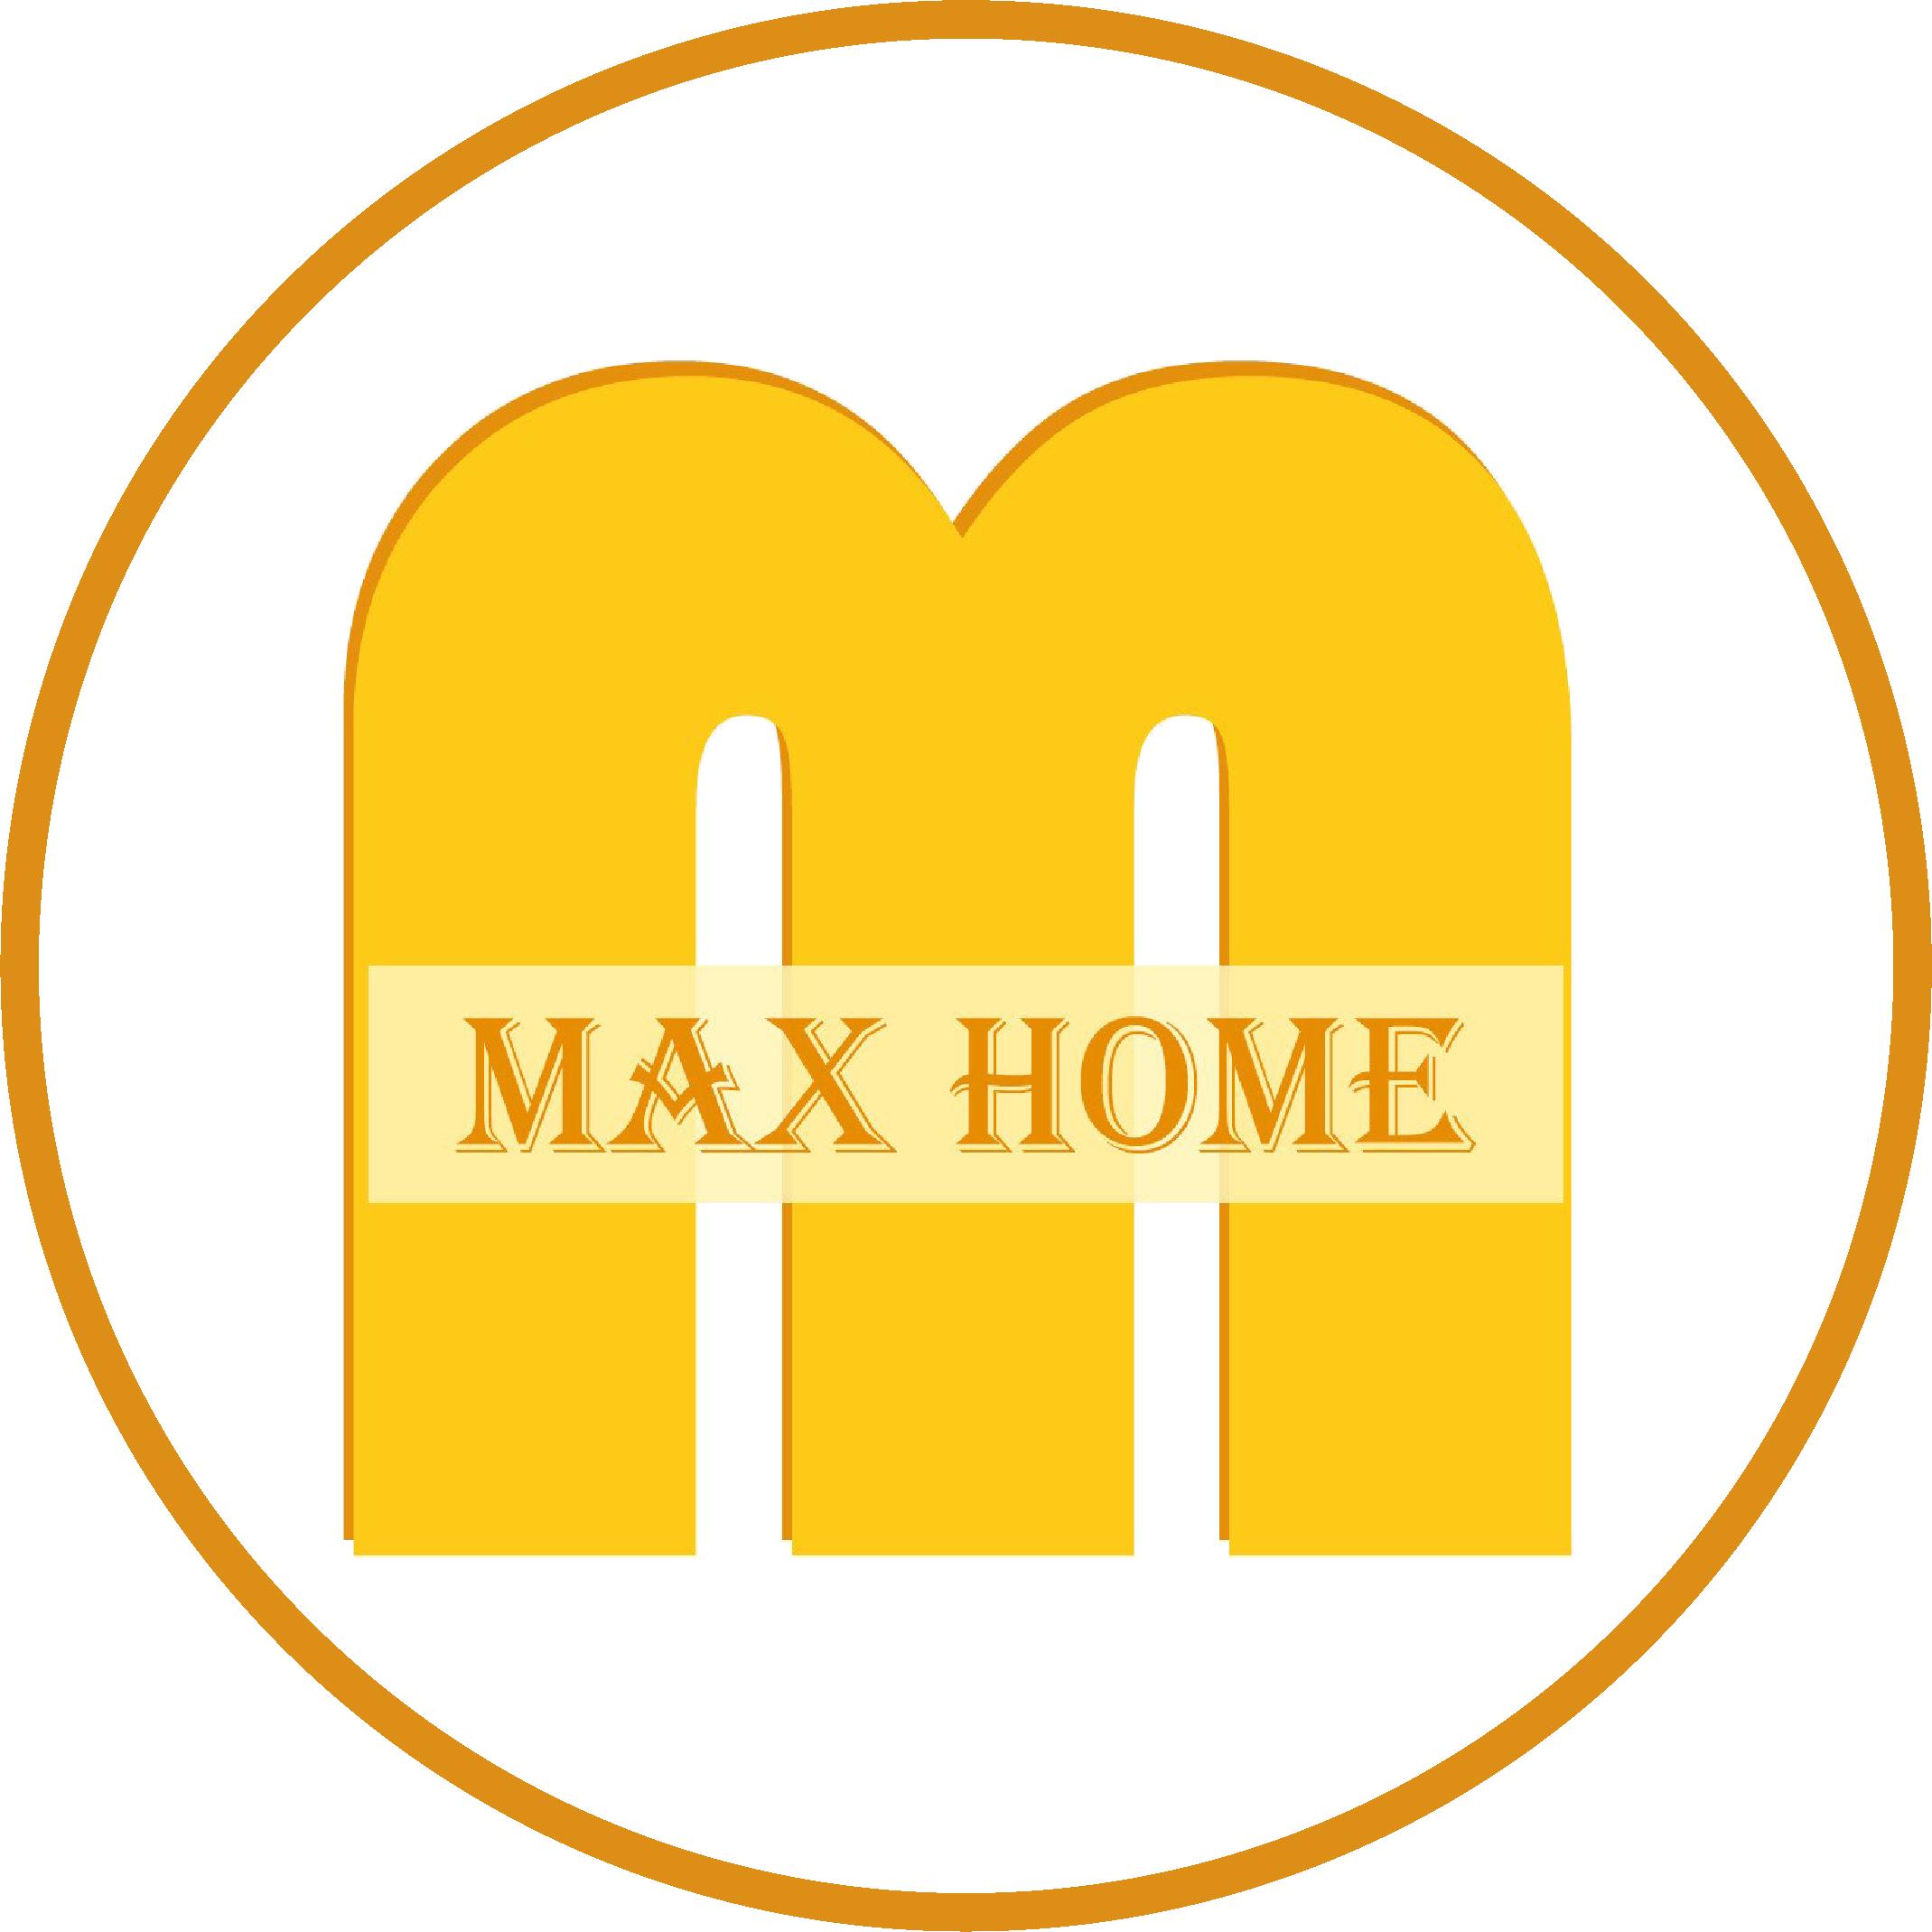 Giới thiệu Maxhome